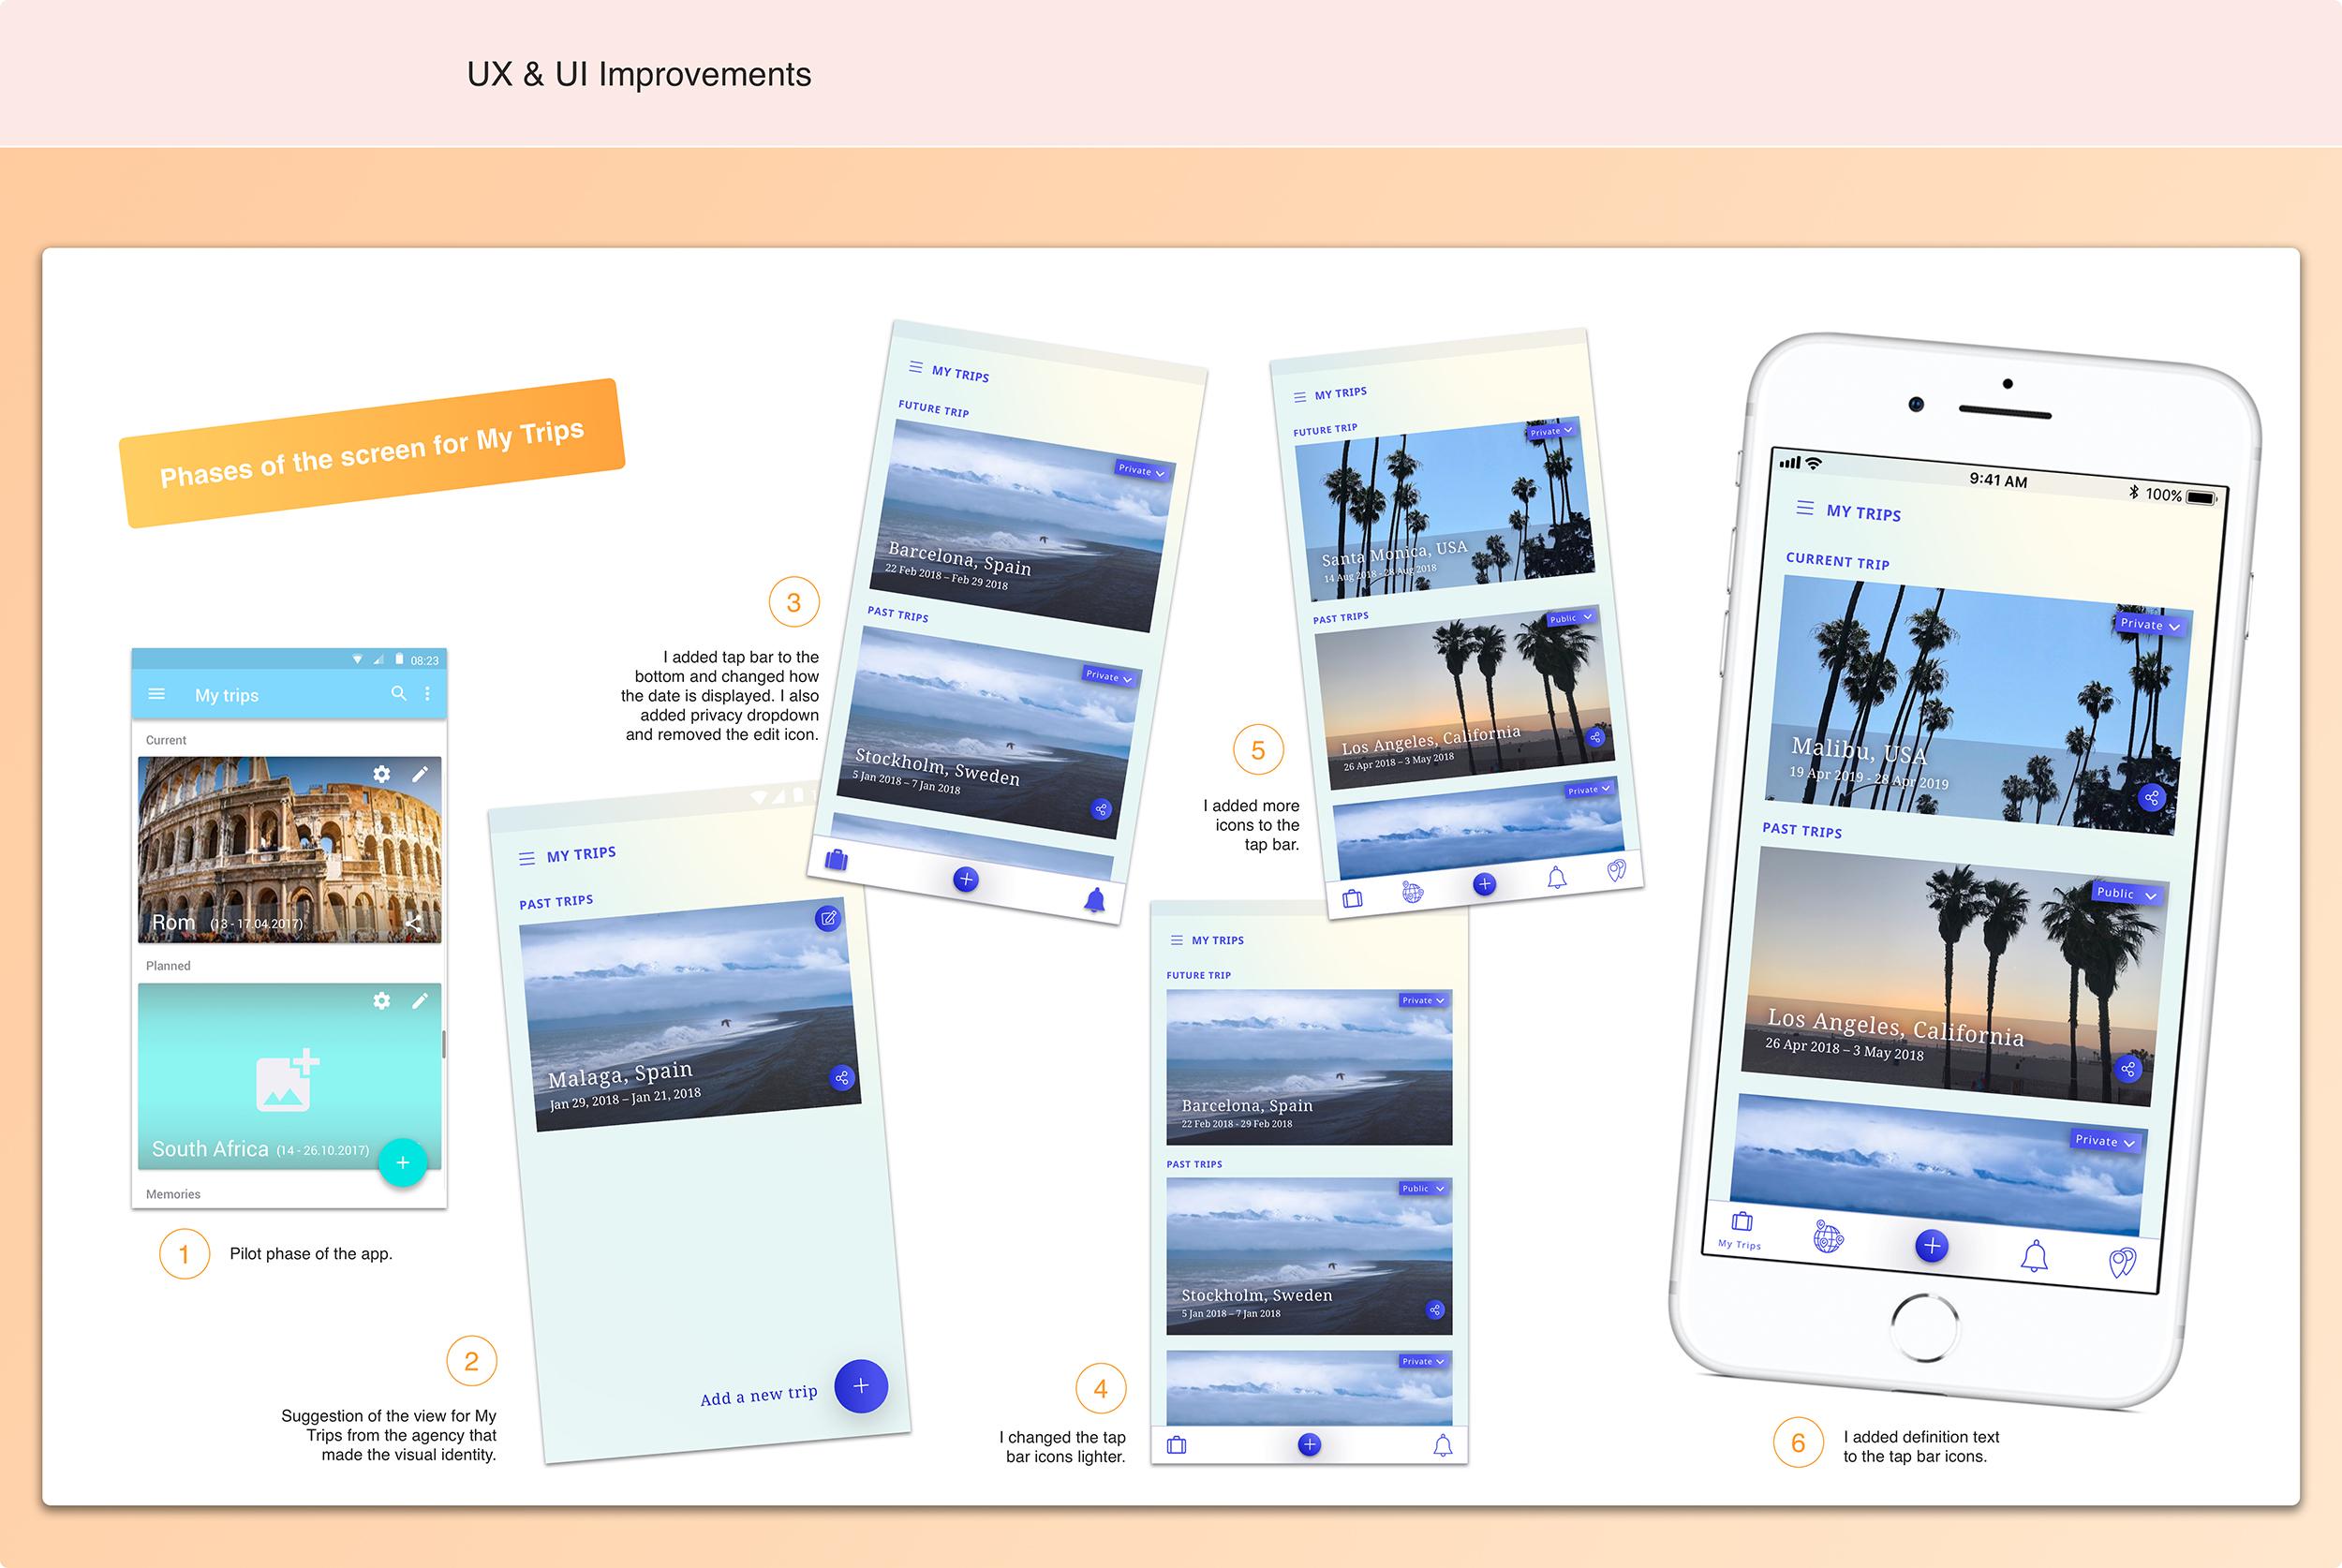 UX_UI_Improvements_app.jpg